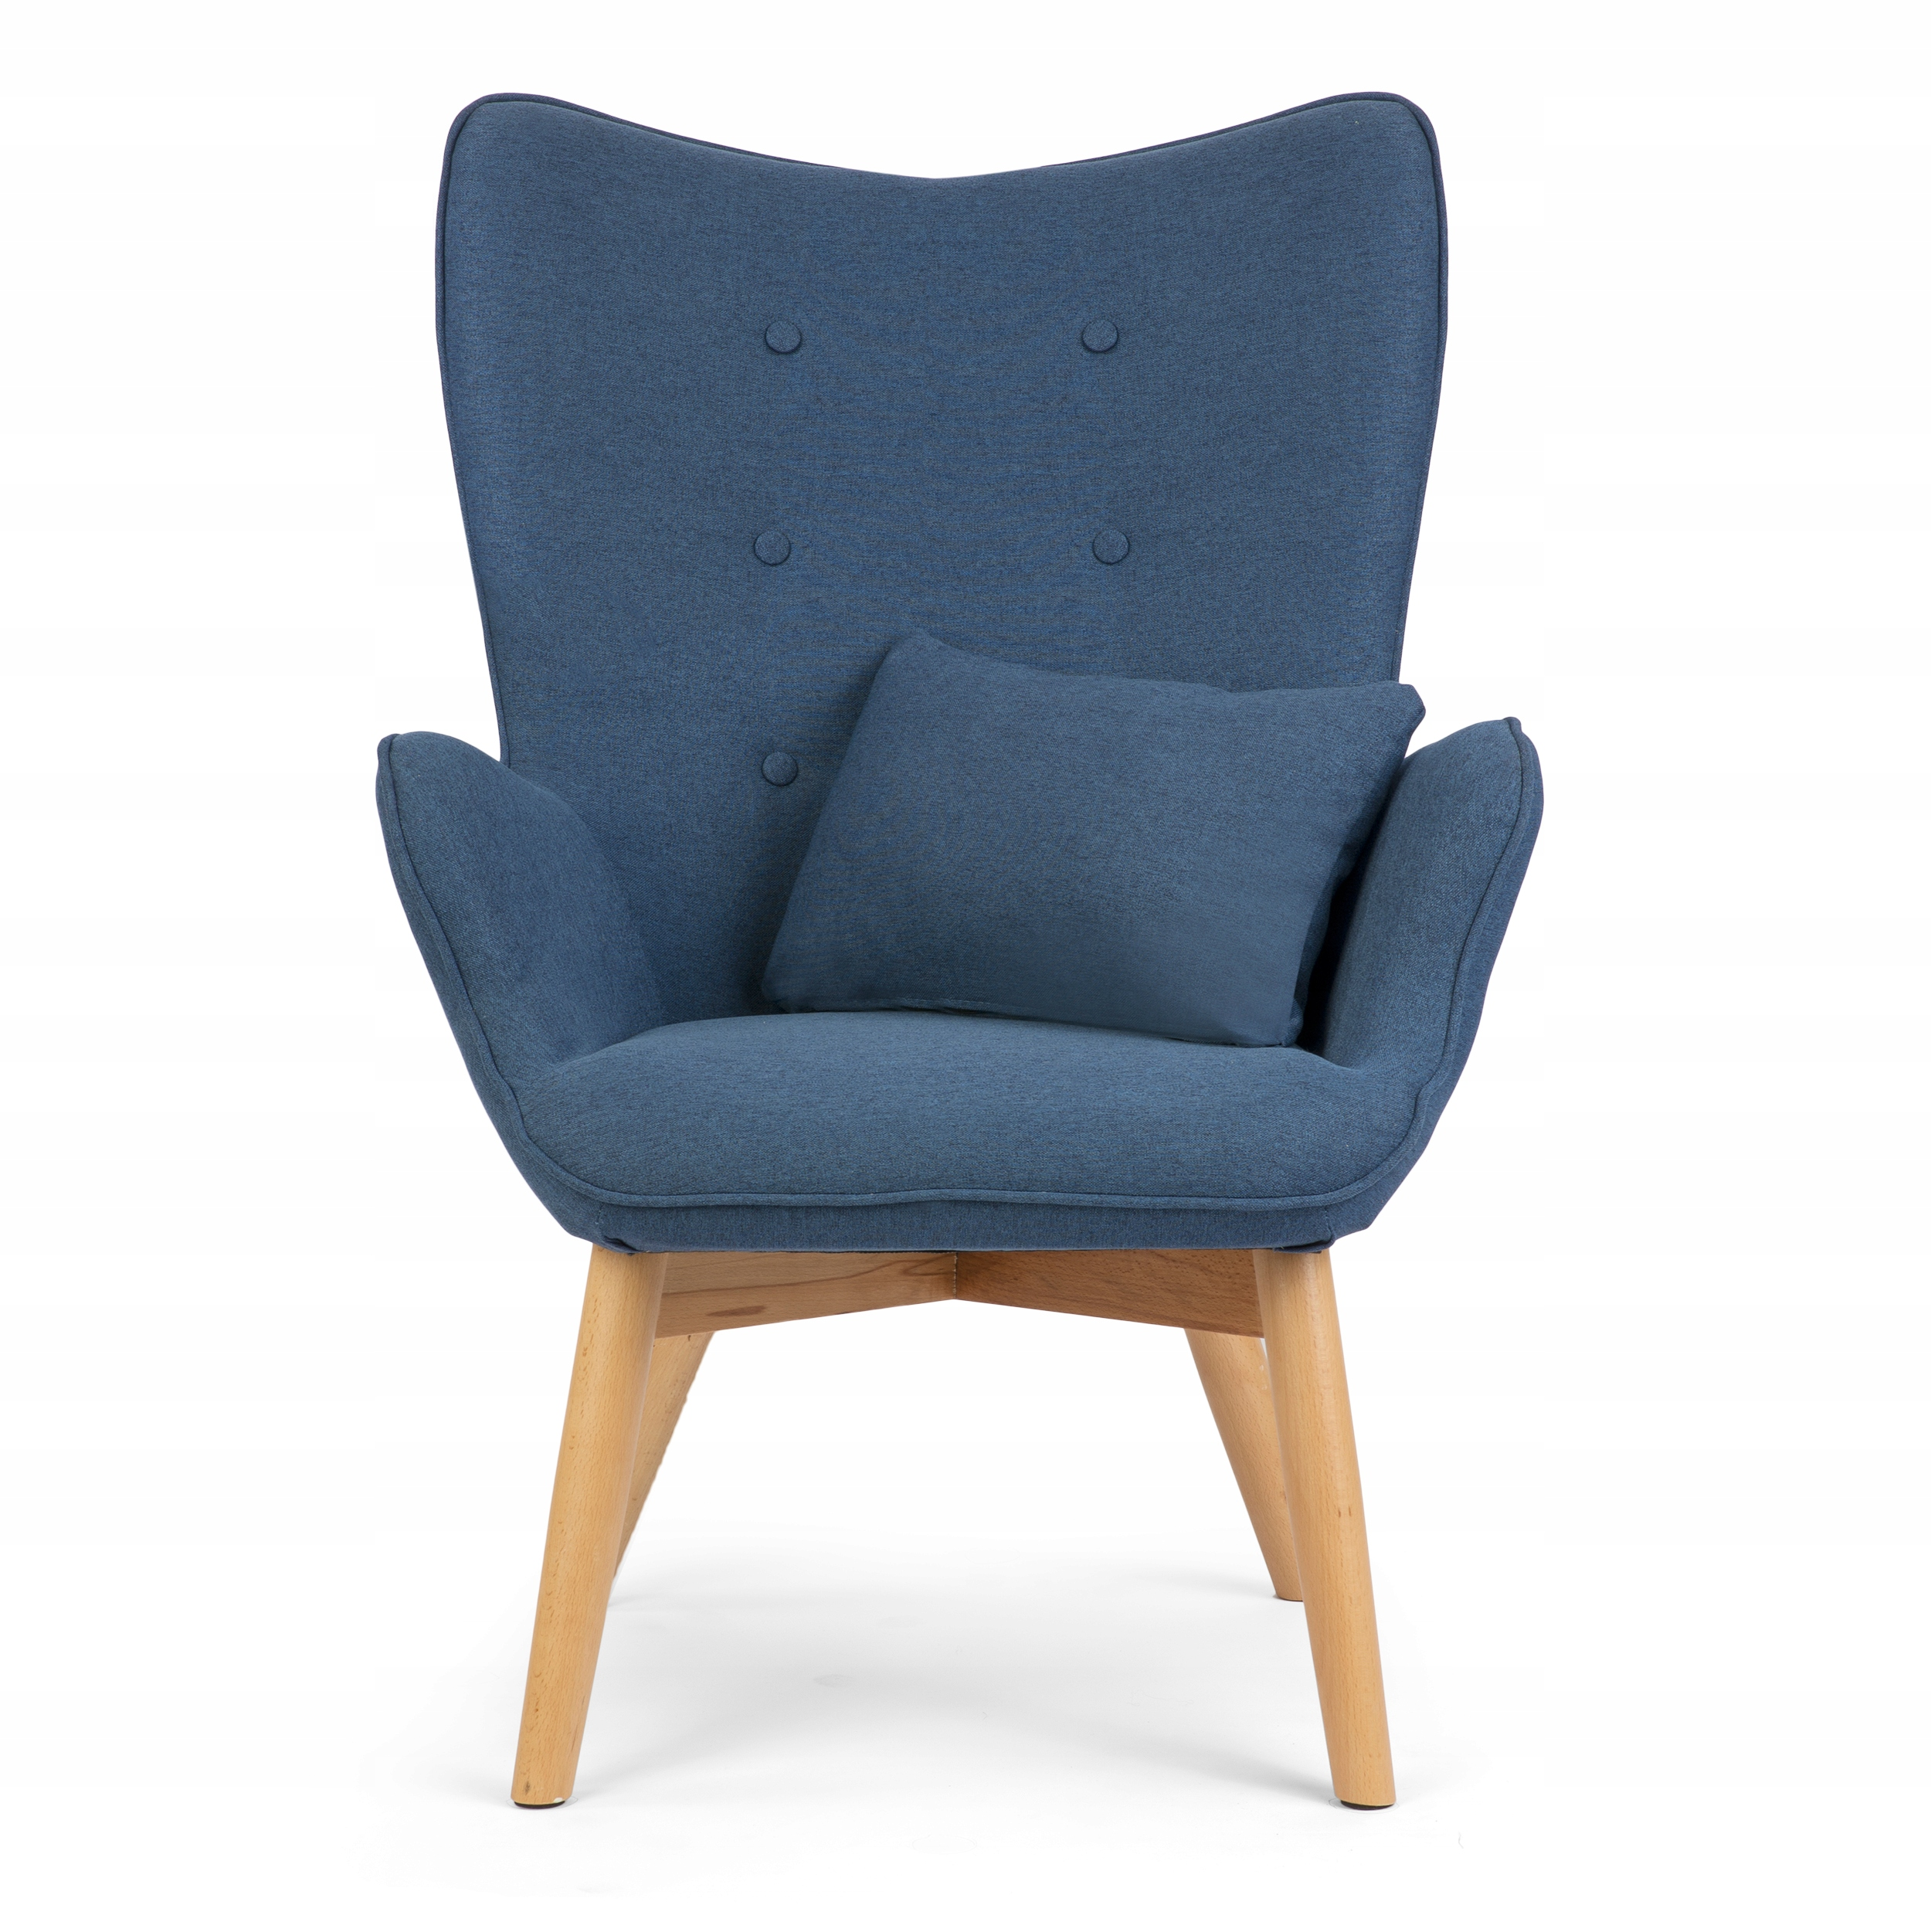 Fotel USZAK styl skandynawski + podnóżek poduszka Kolekcja Norse